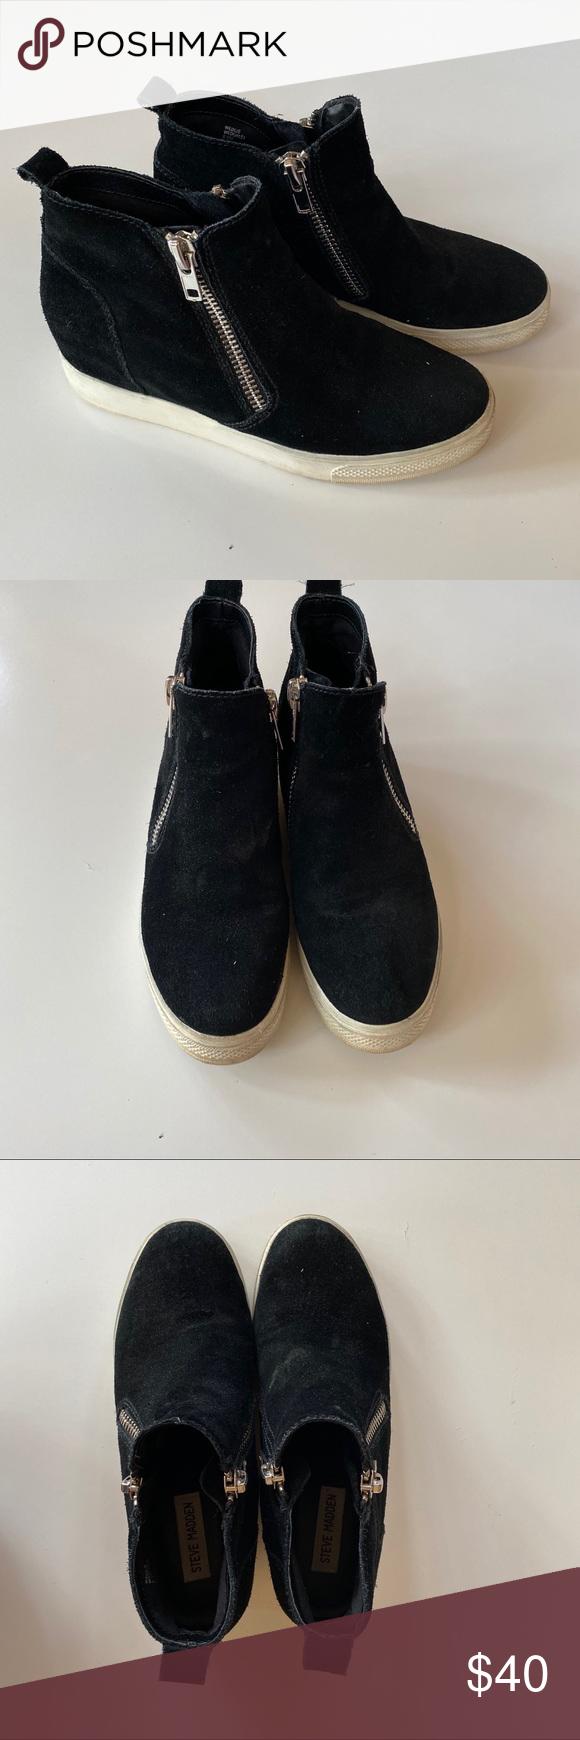 Steve Madden Wedgie High Top Platform Sneaker Platform